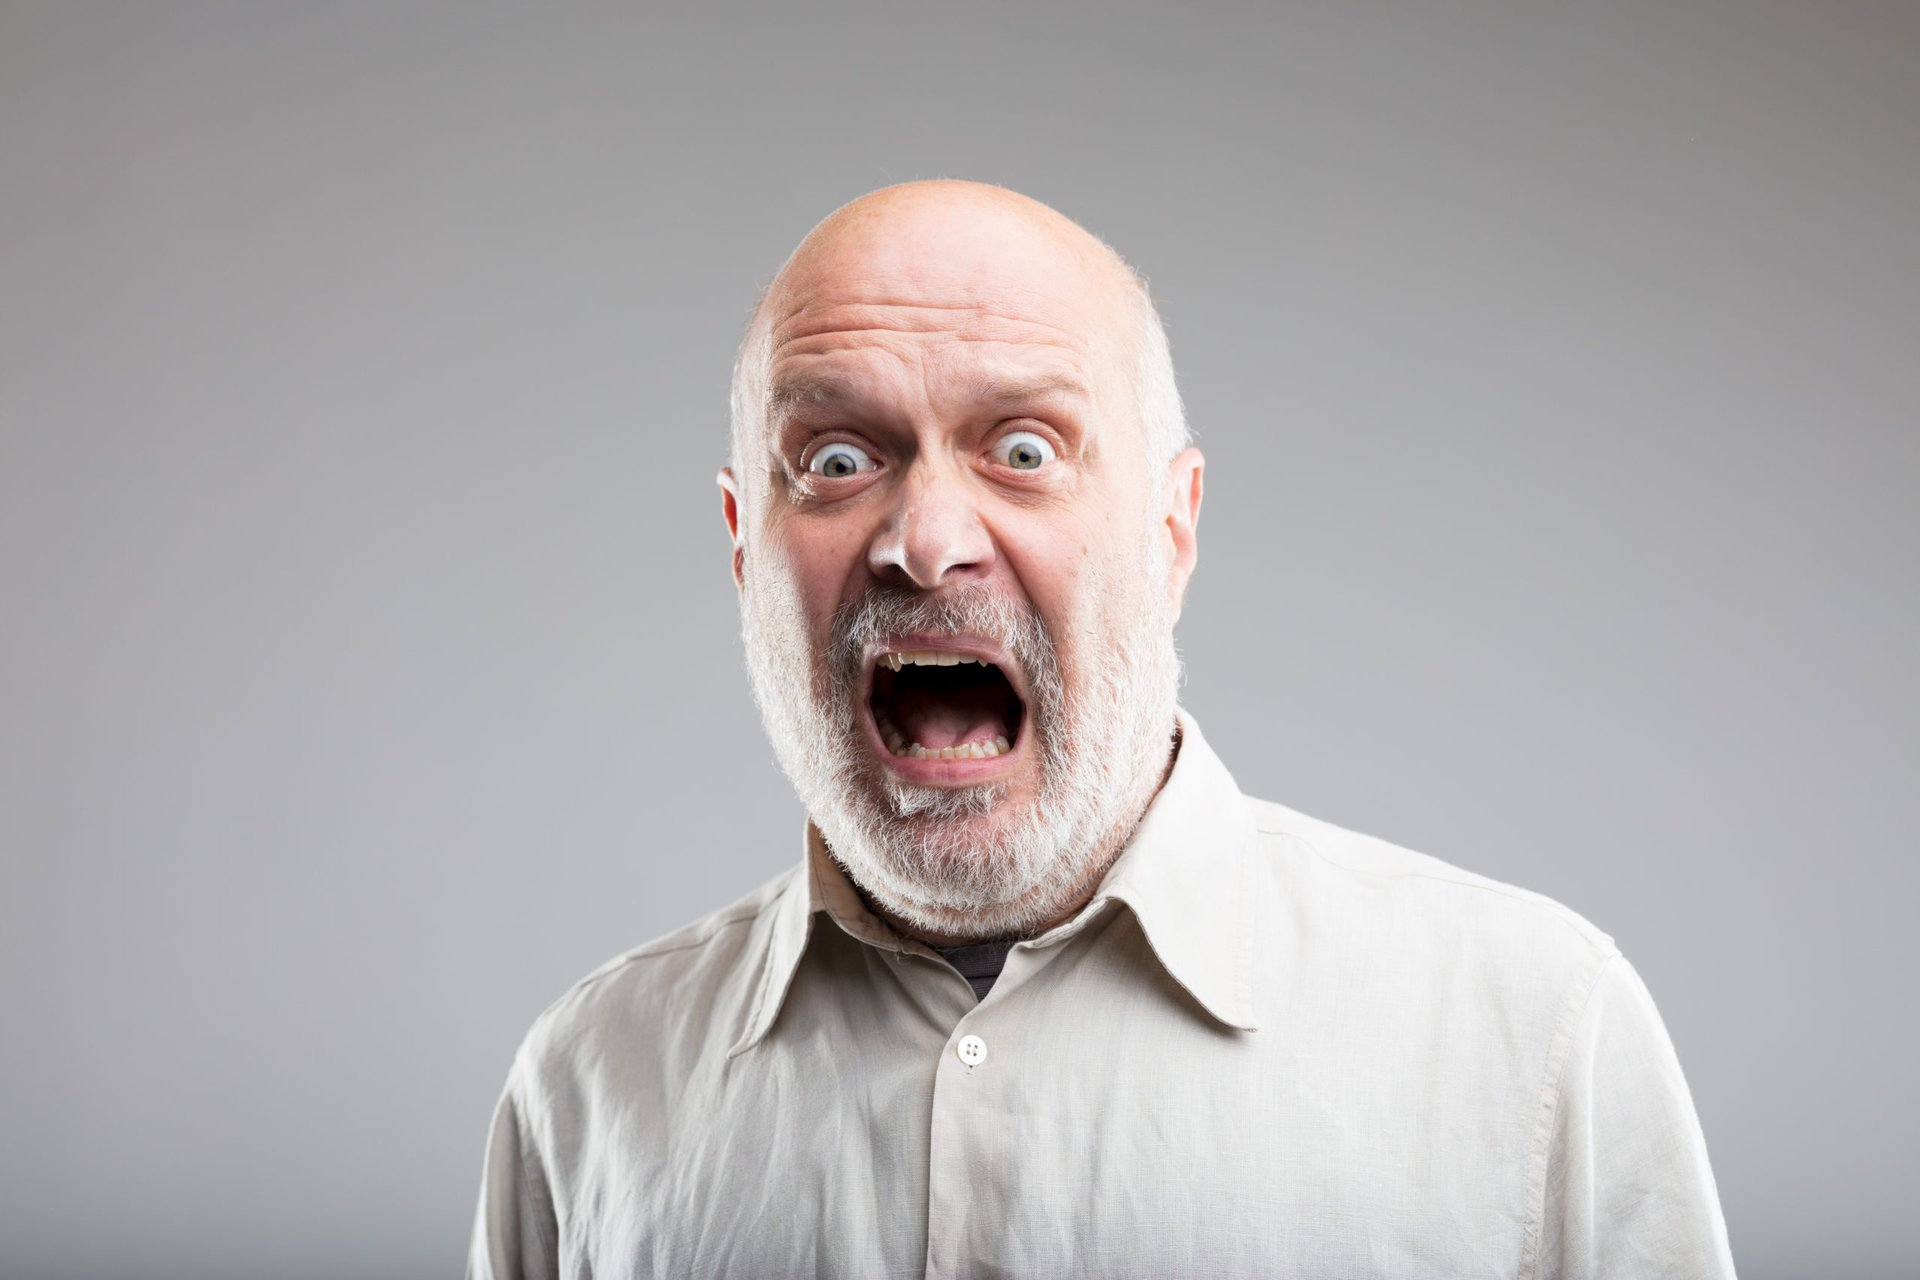 Scared retiree